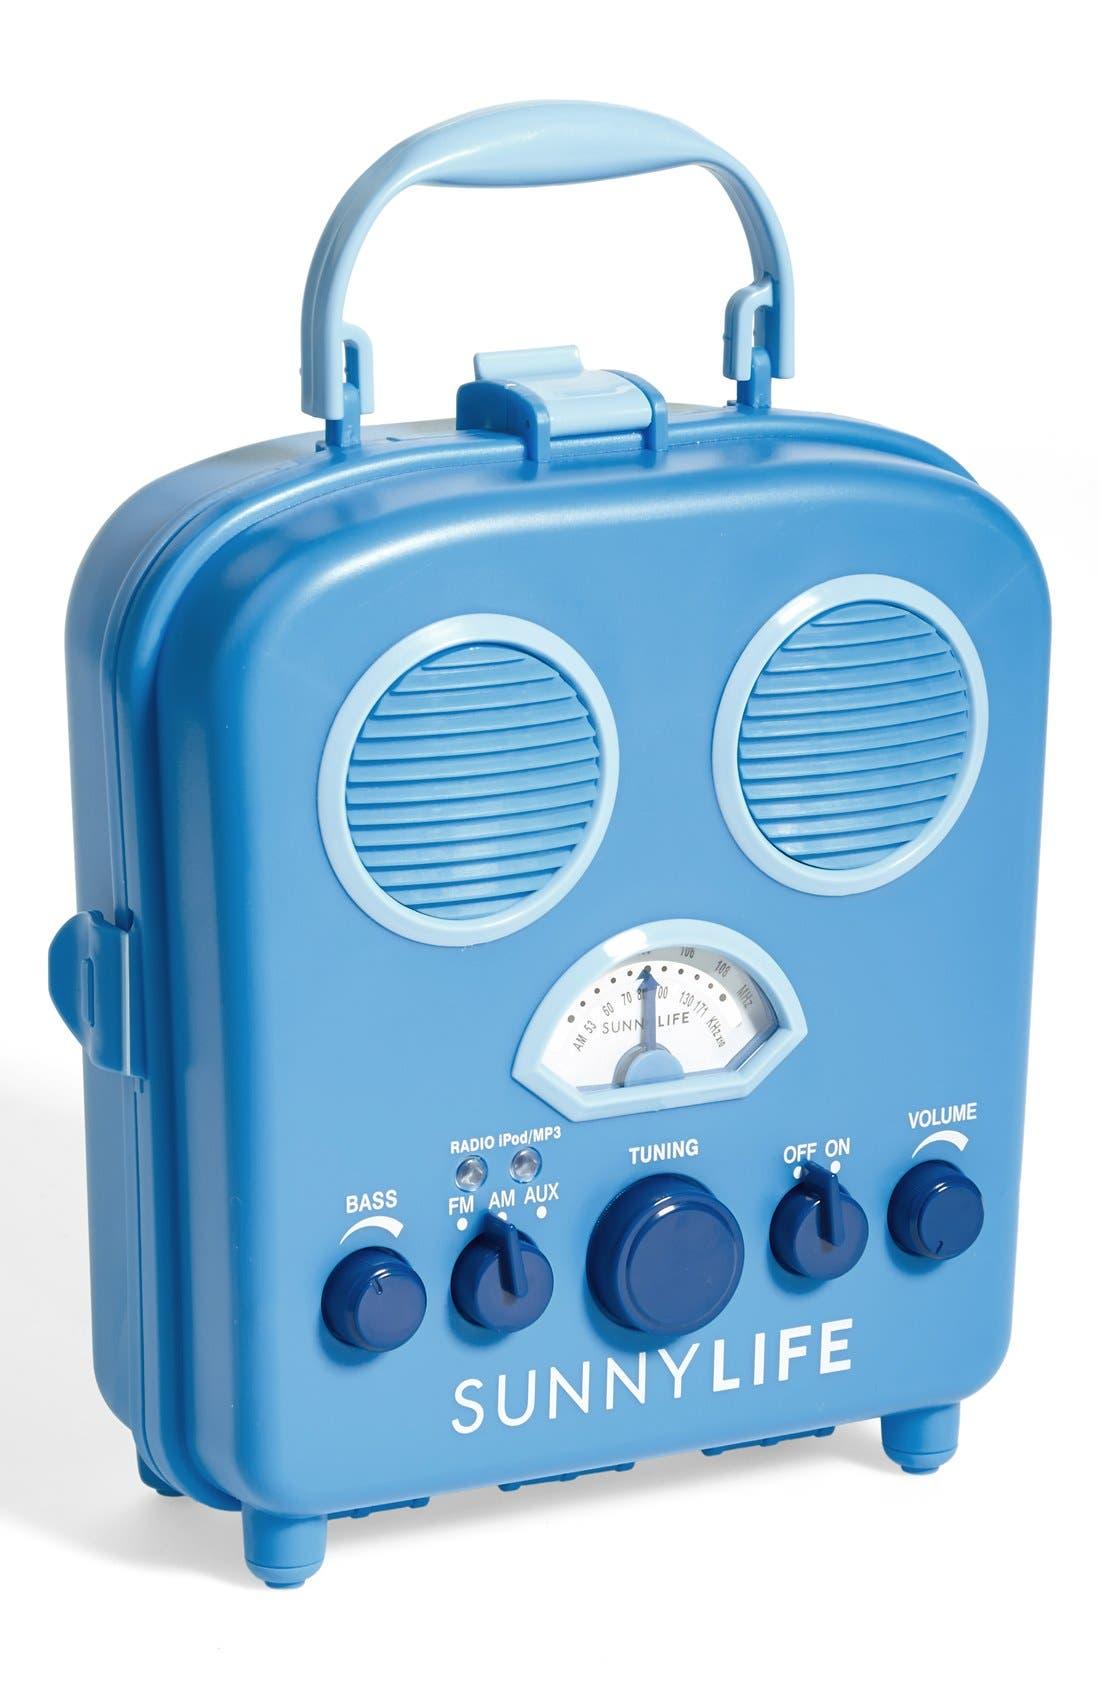 Main Image - Sunnylife 'Beach Sounds' Portable Water Resistant Speaker & Radio